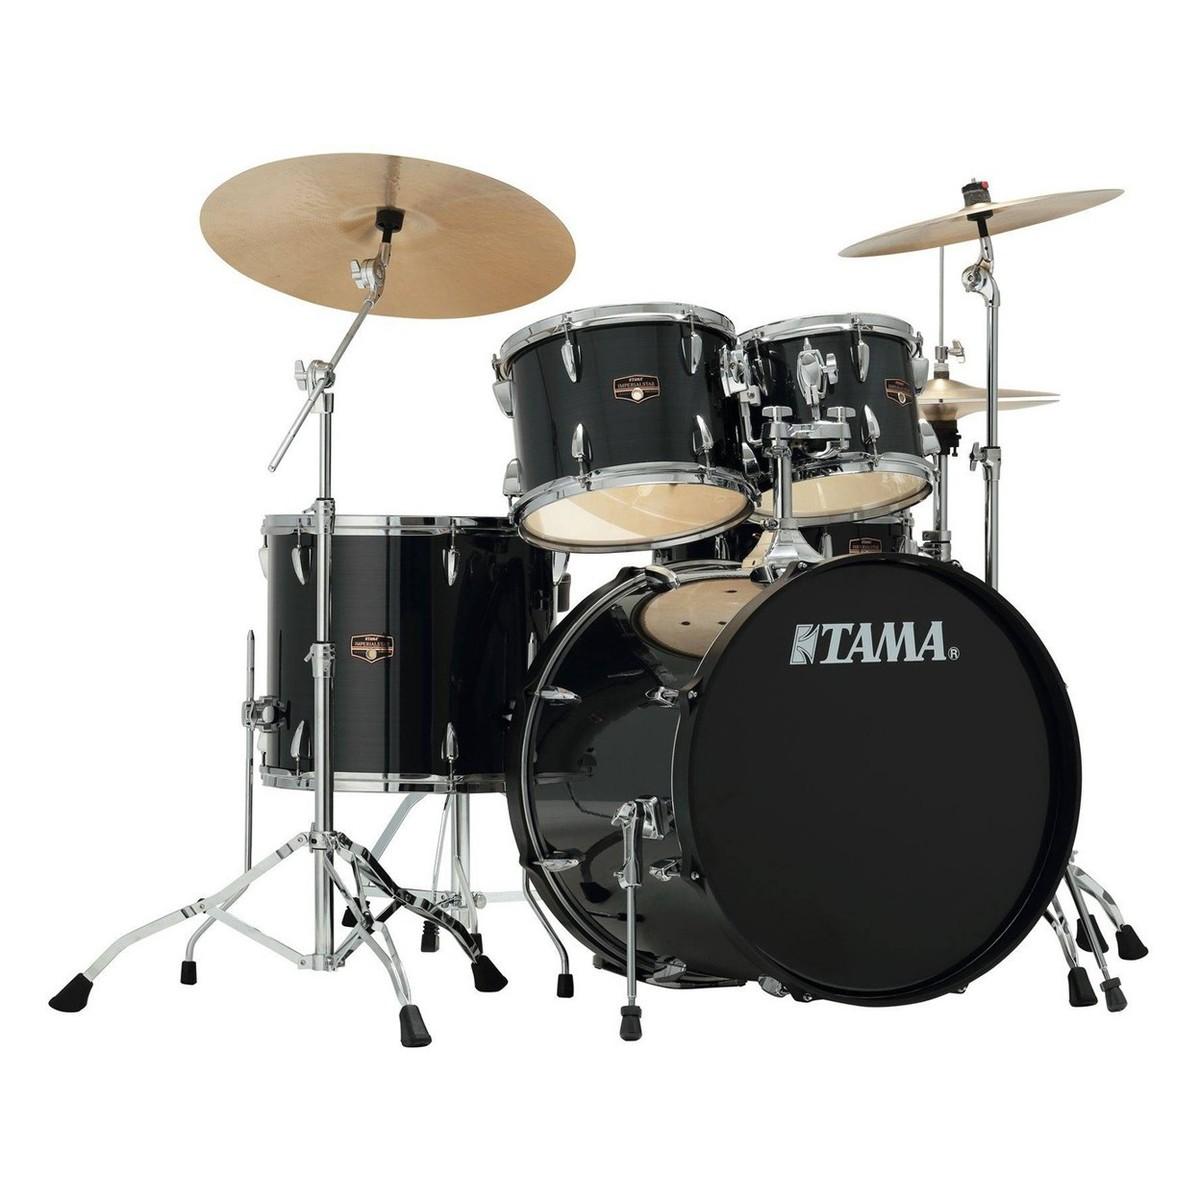 tama imperialstar 20 39 39 5pc drum kit hairline black at gear4music. Black Bedroom Furniture Sets. Home Design Ideas